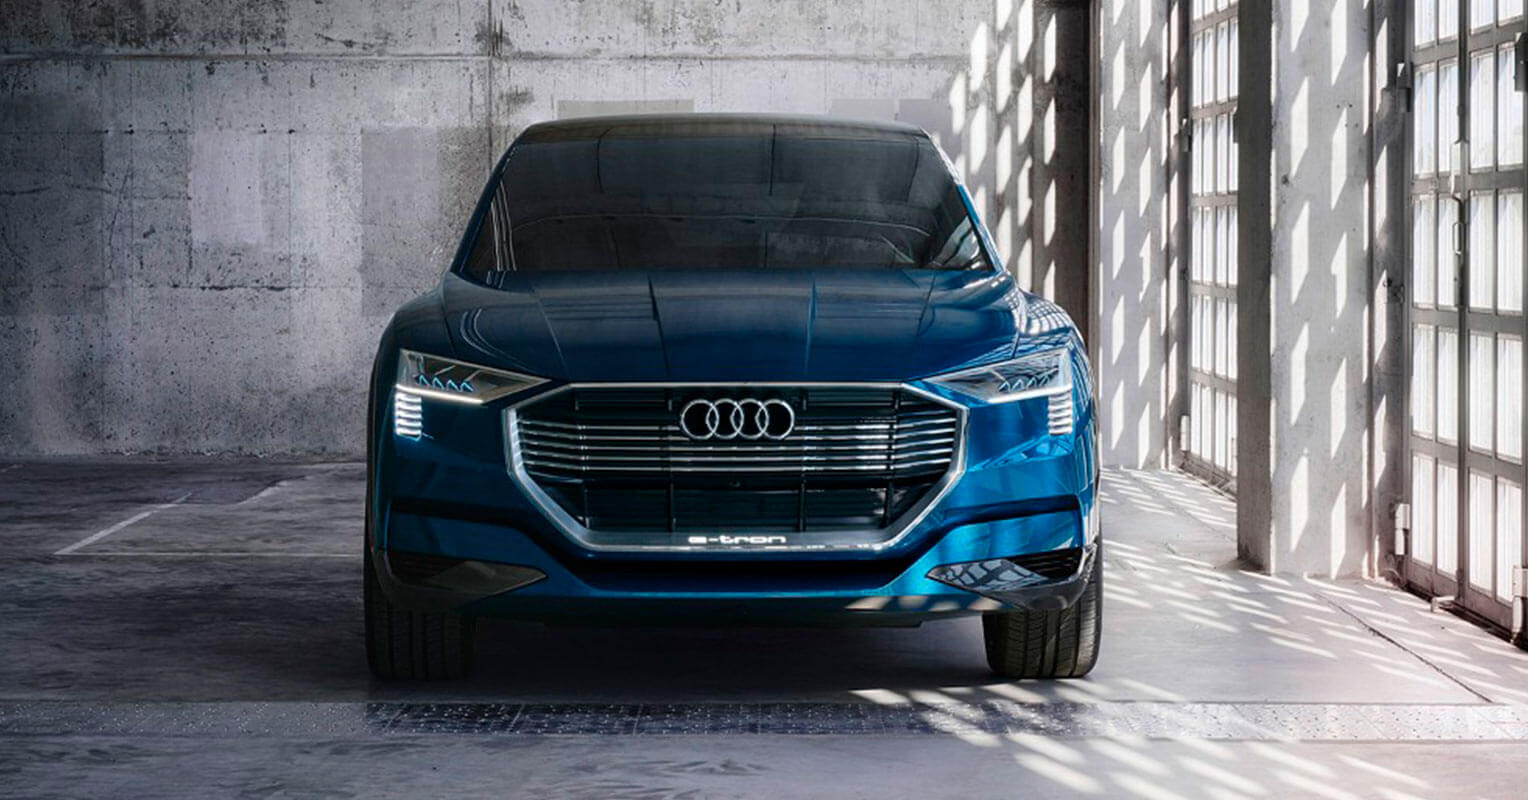 Audi e-tron quattro frontal